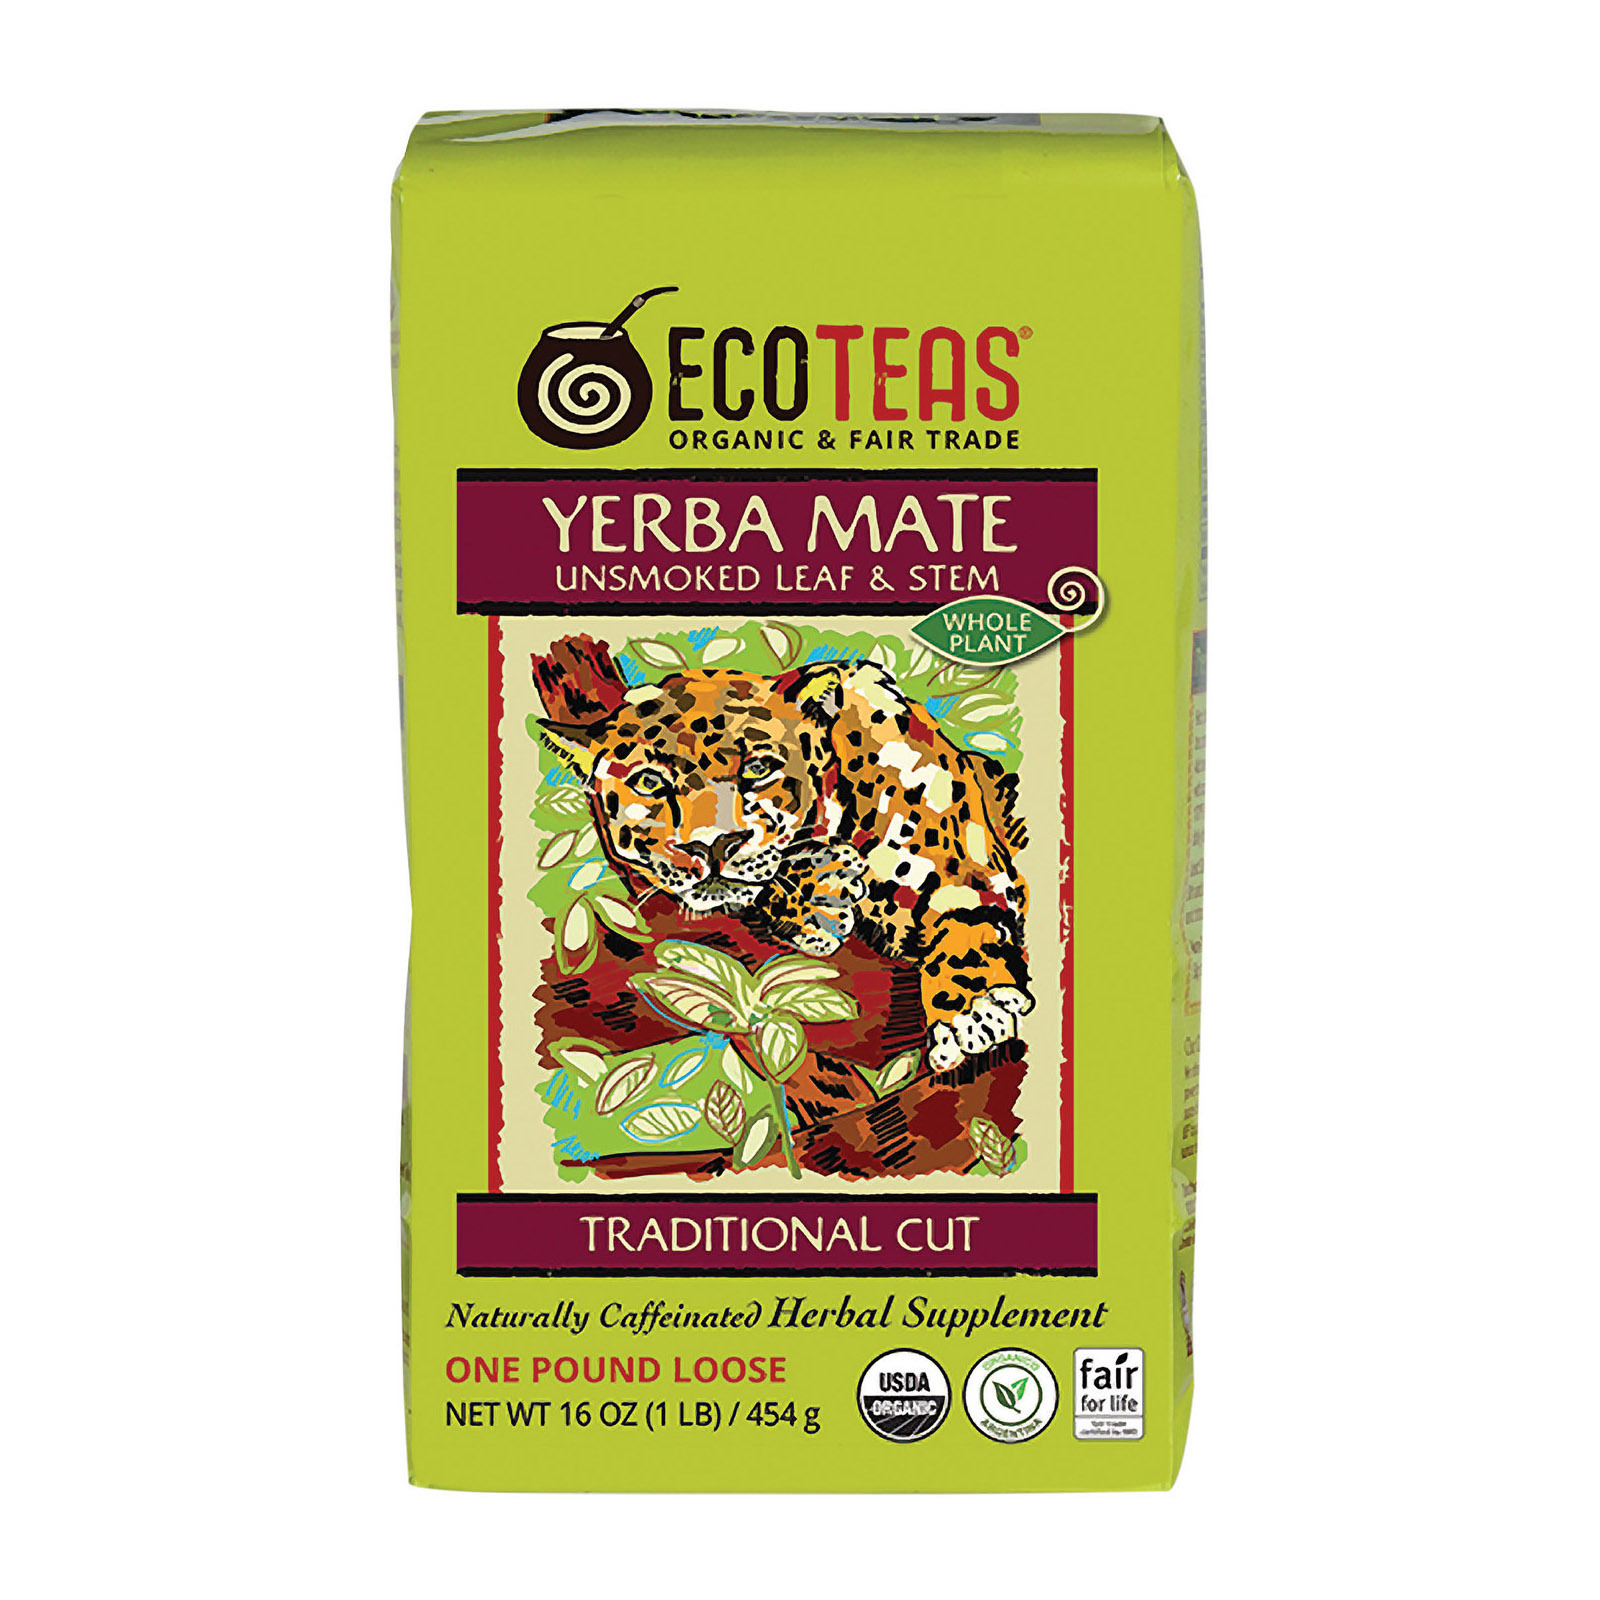 Ecoteas Organic Loose Yerba Mate - Traditional Cut - Case of 6 - 1 lb.